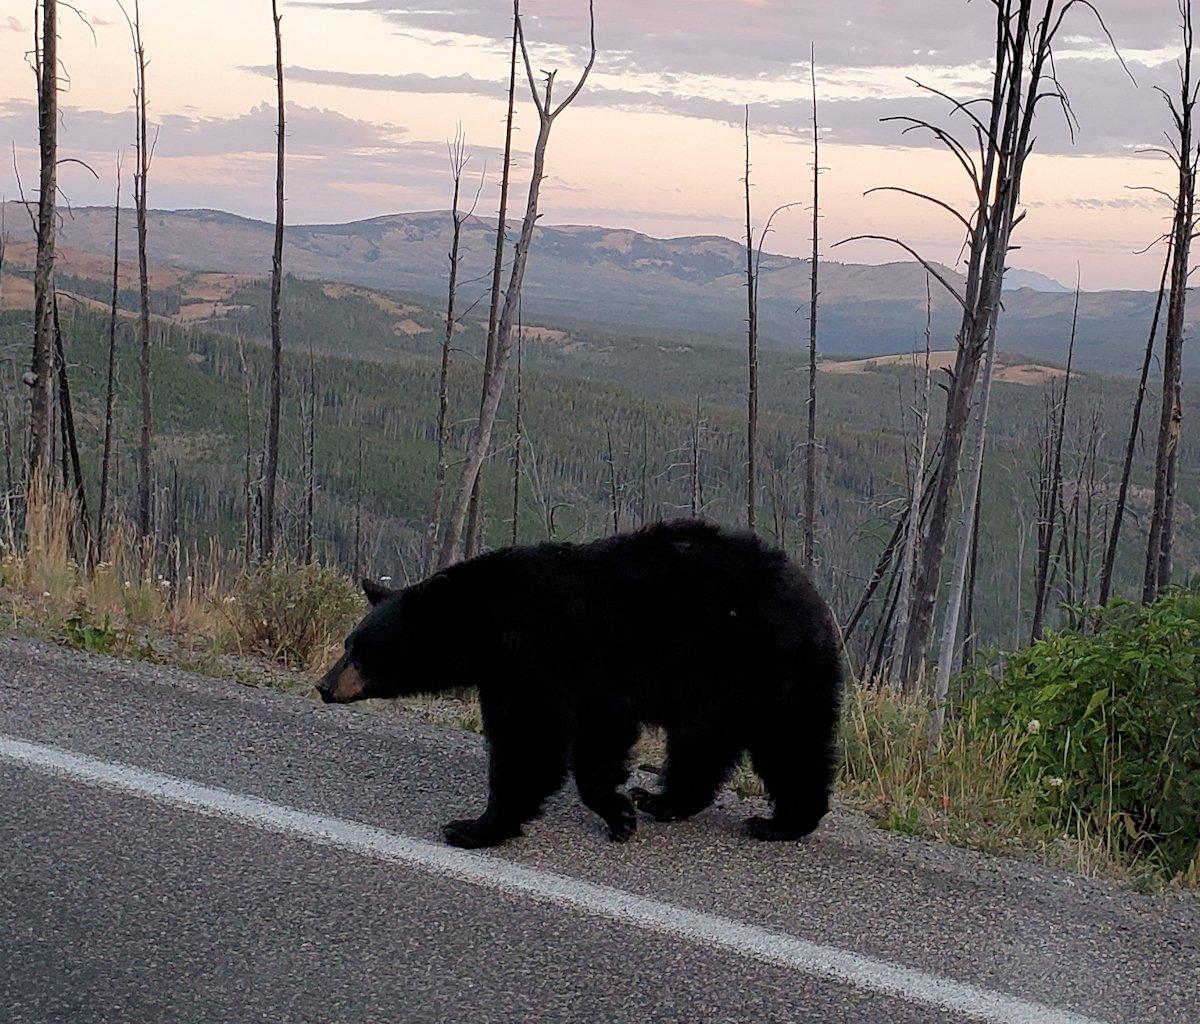 4 1/4 bears